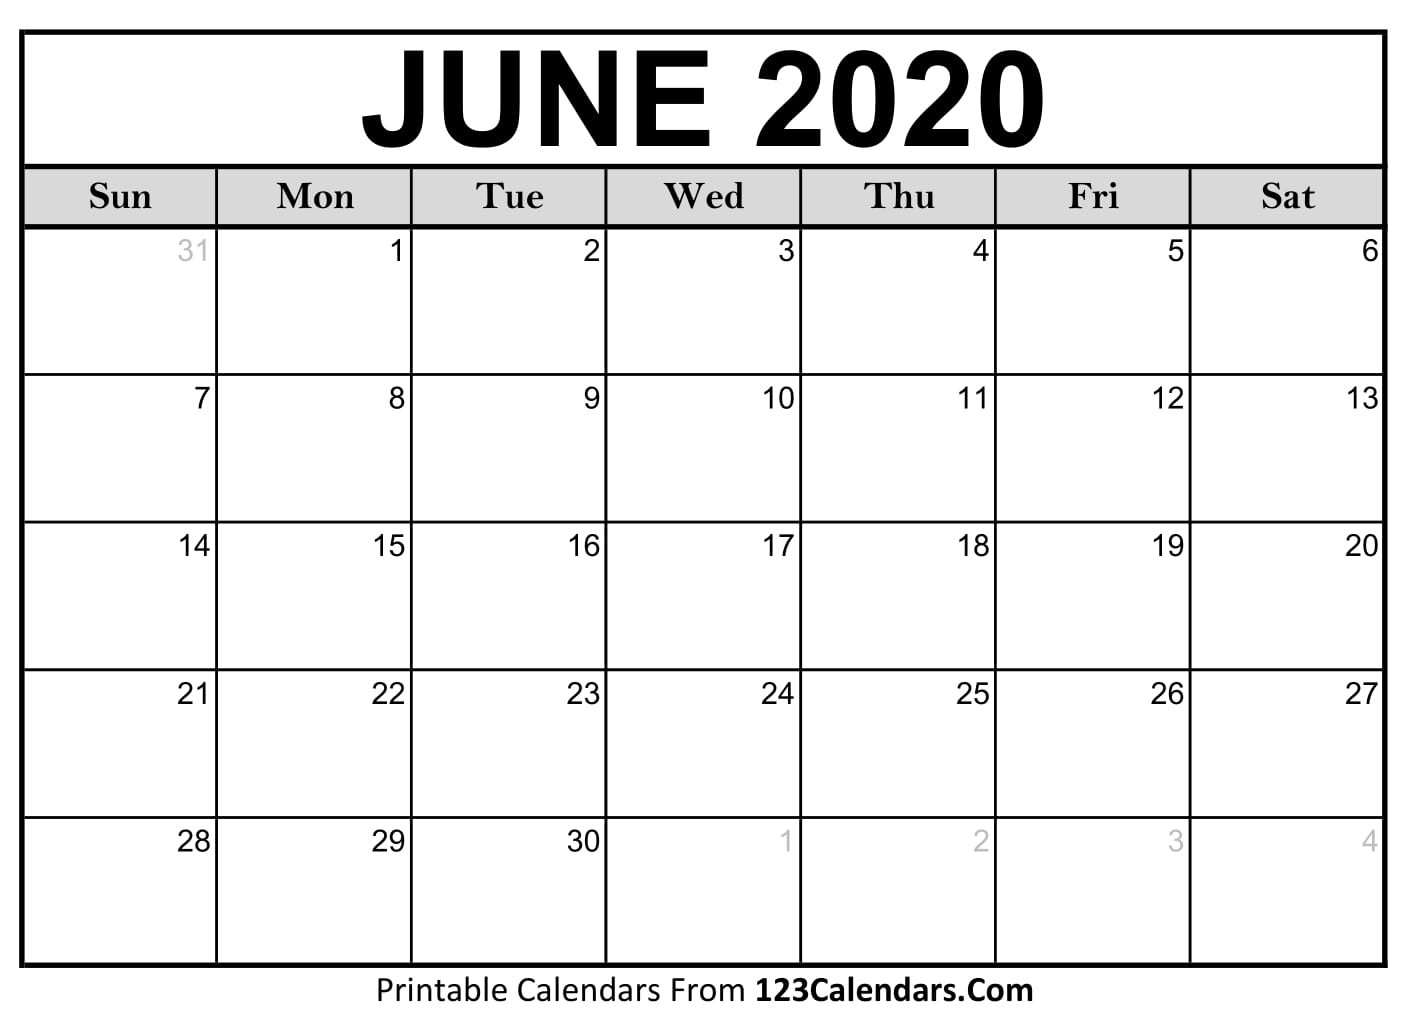 2020 Catholic Monthly Calendar Printable | Calendar Template